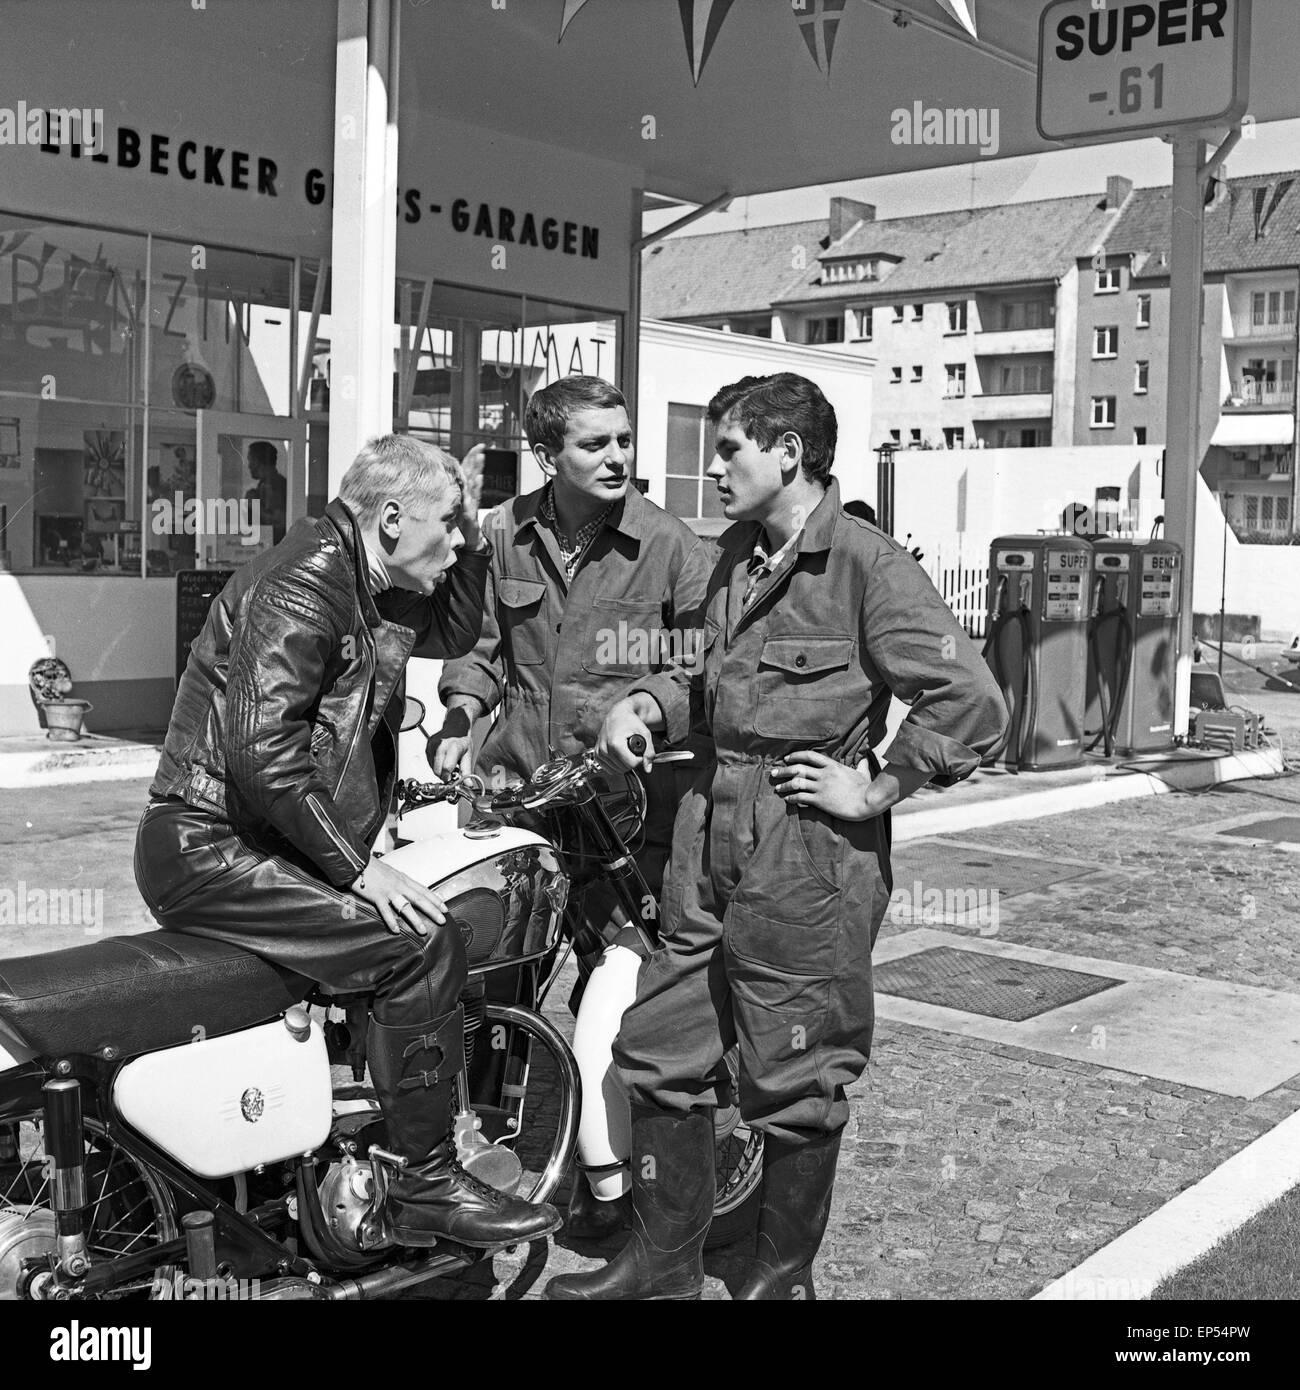 1960s Petrol Station Stock Photos & 1960s Petrol Station